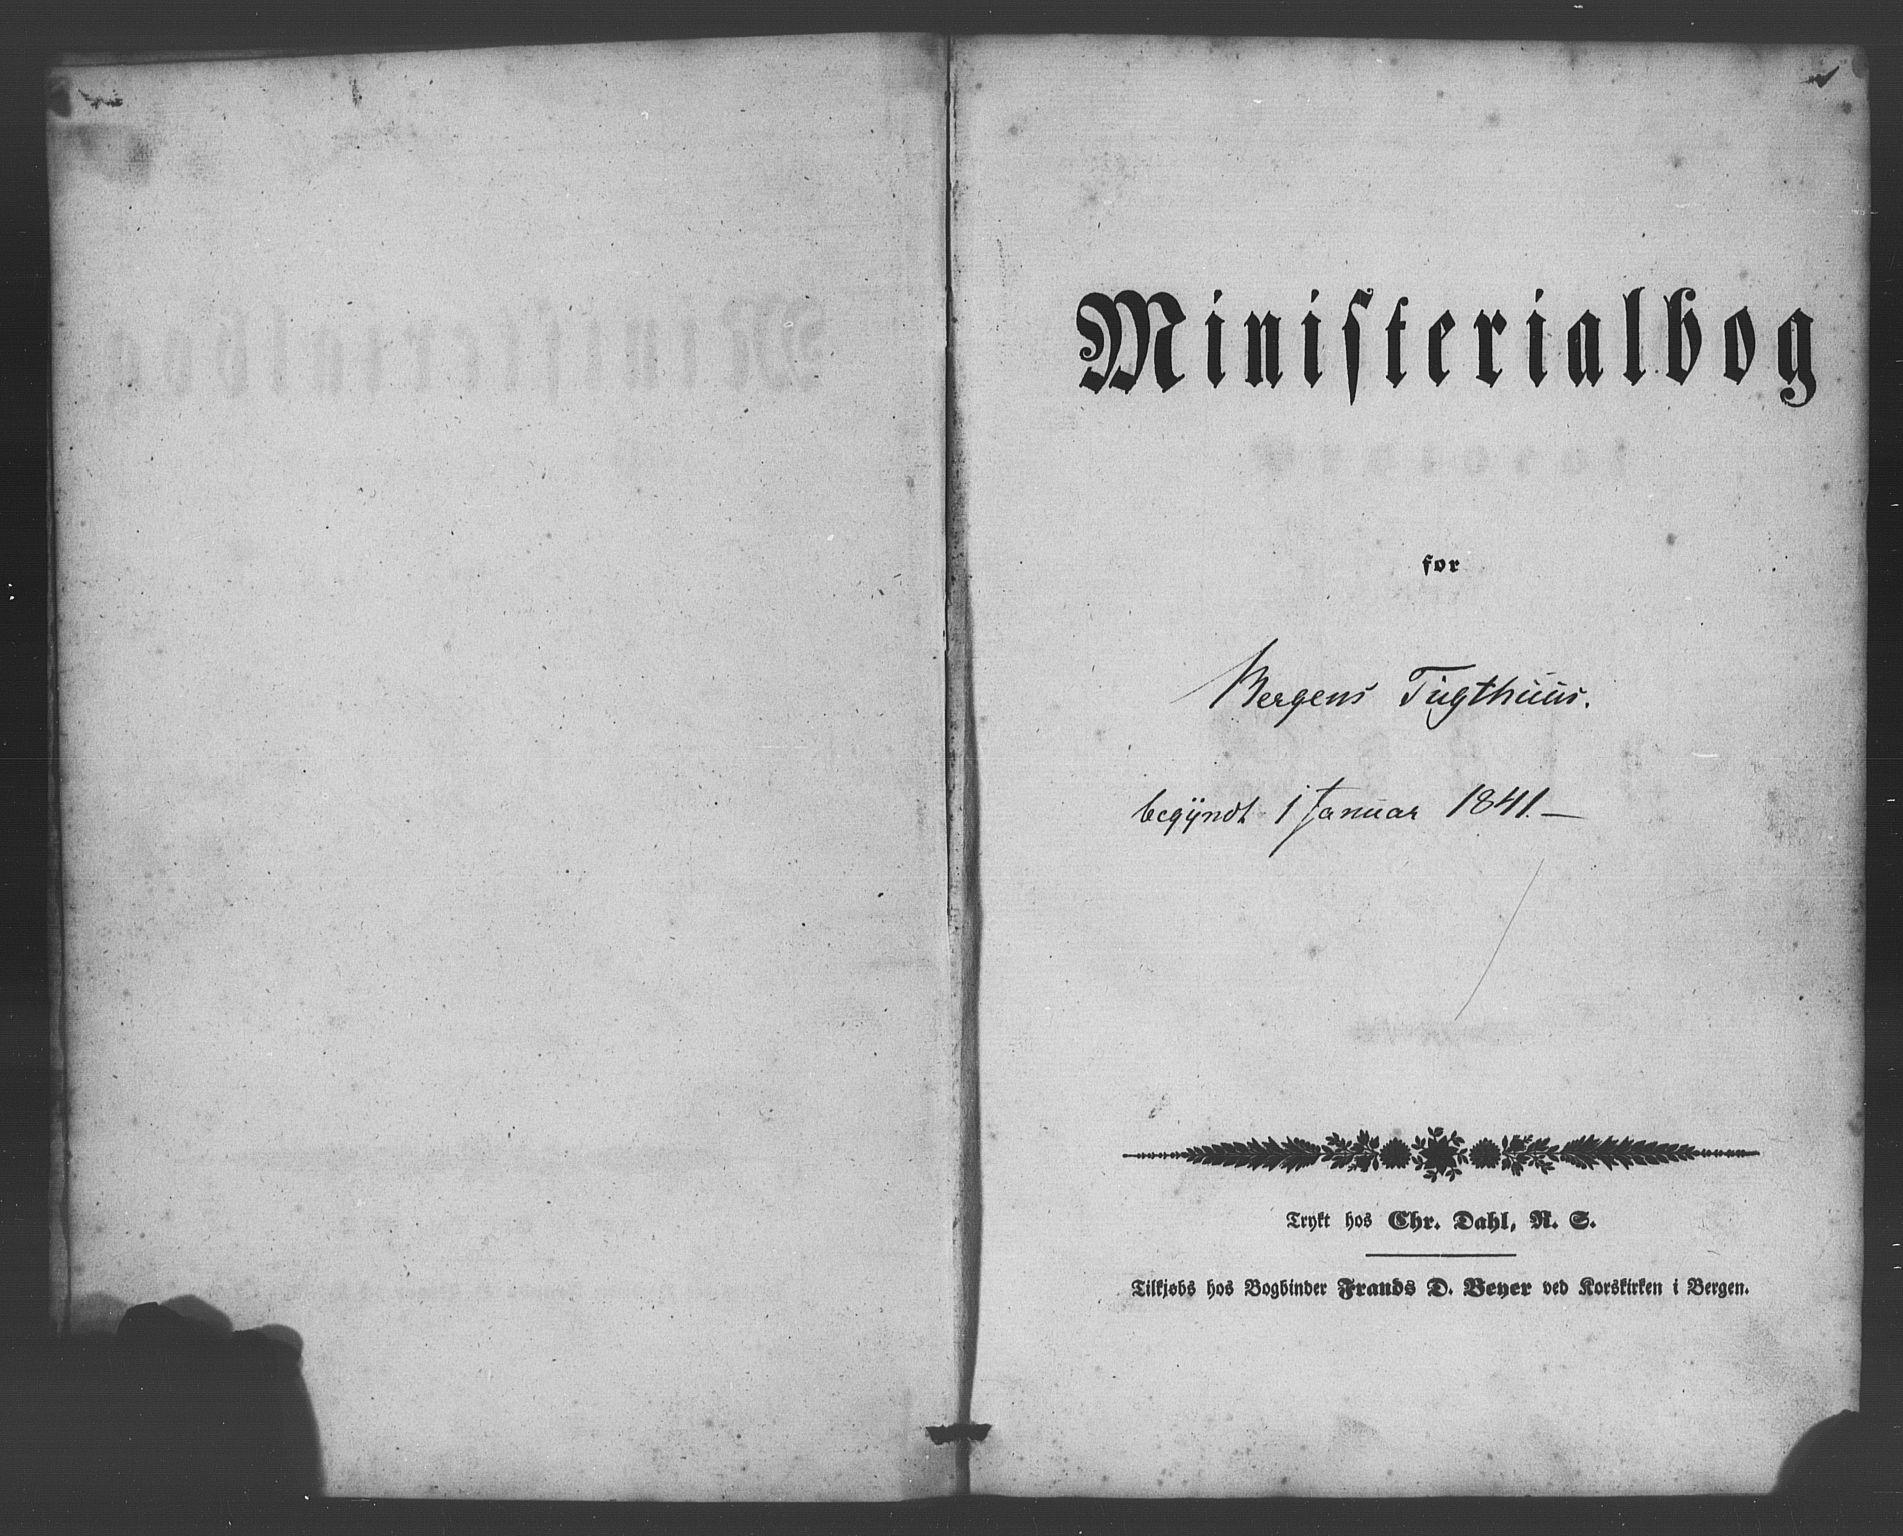 SAB, Bergens strafanstalts sokneprestembete*, Ministerialbok nr. A 1, 1841-1884, s. 1